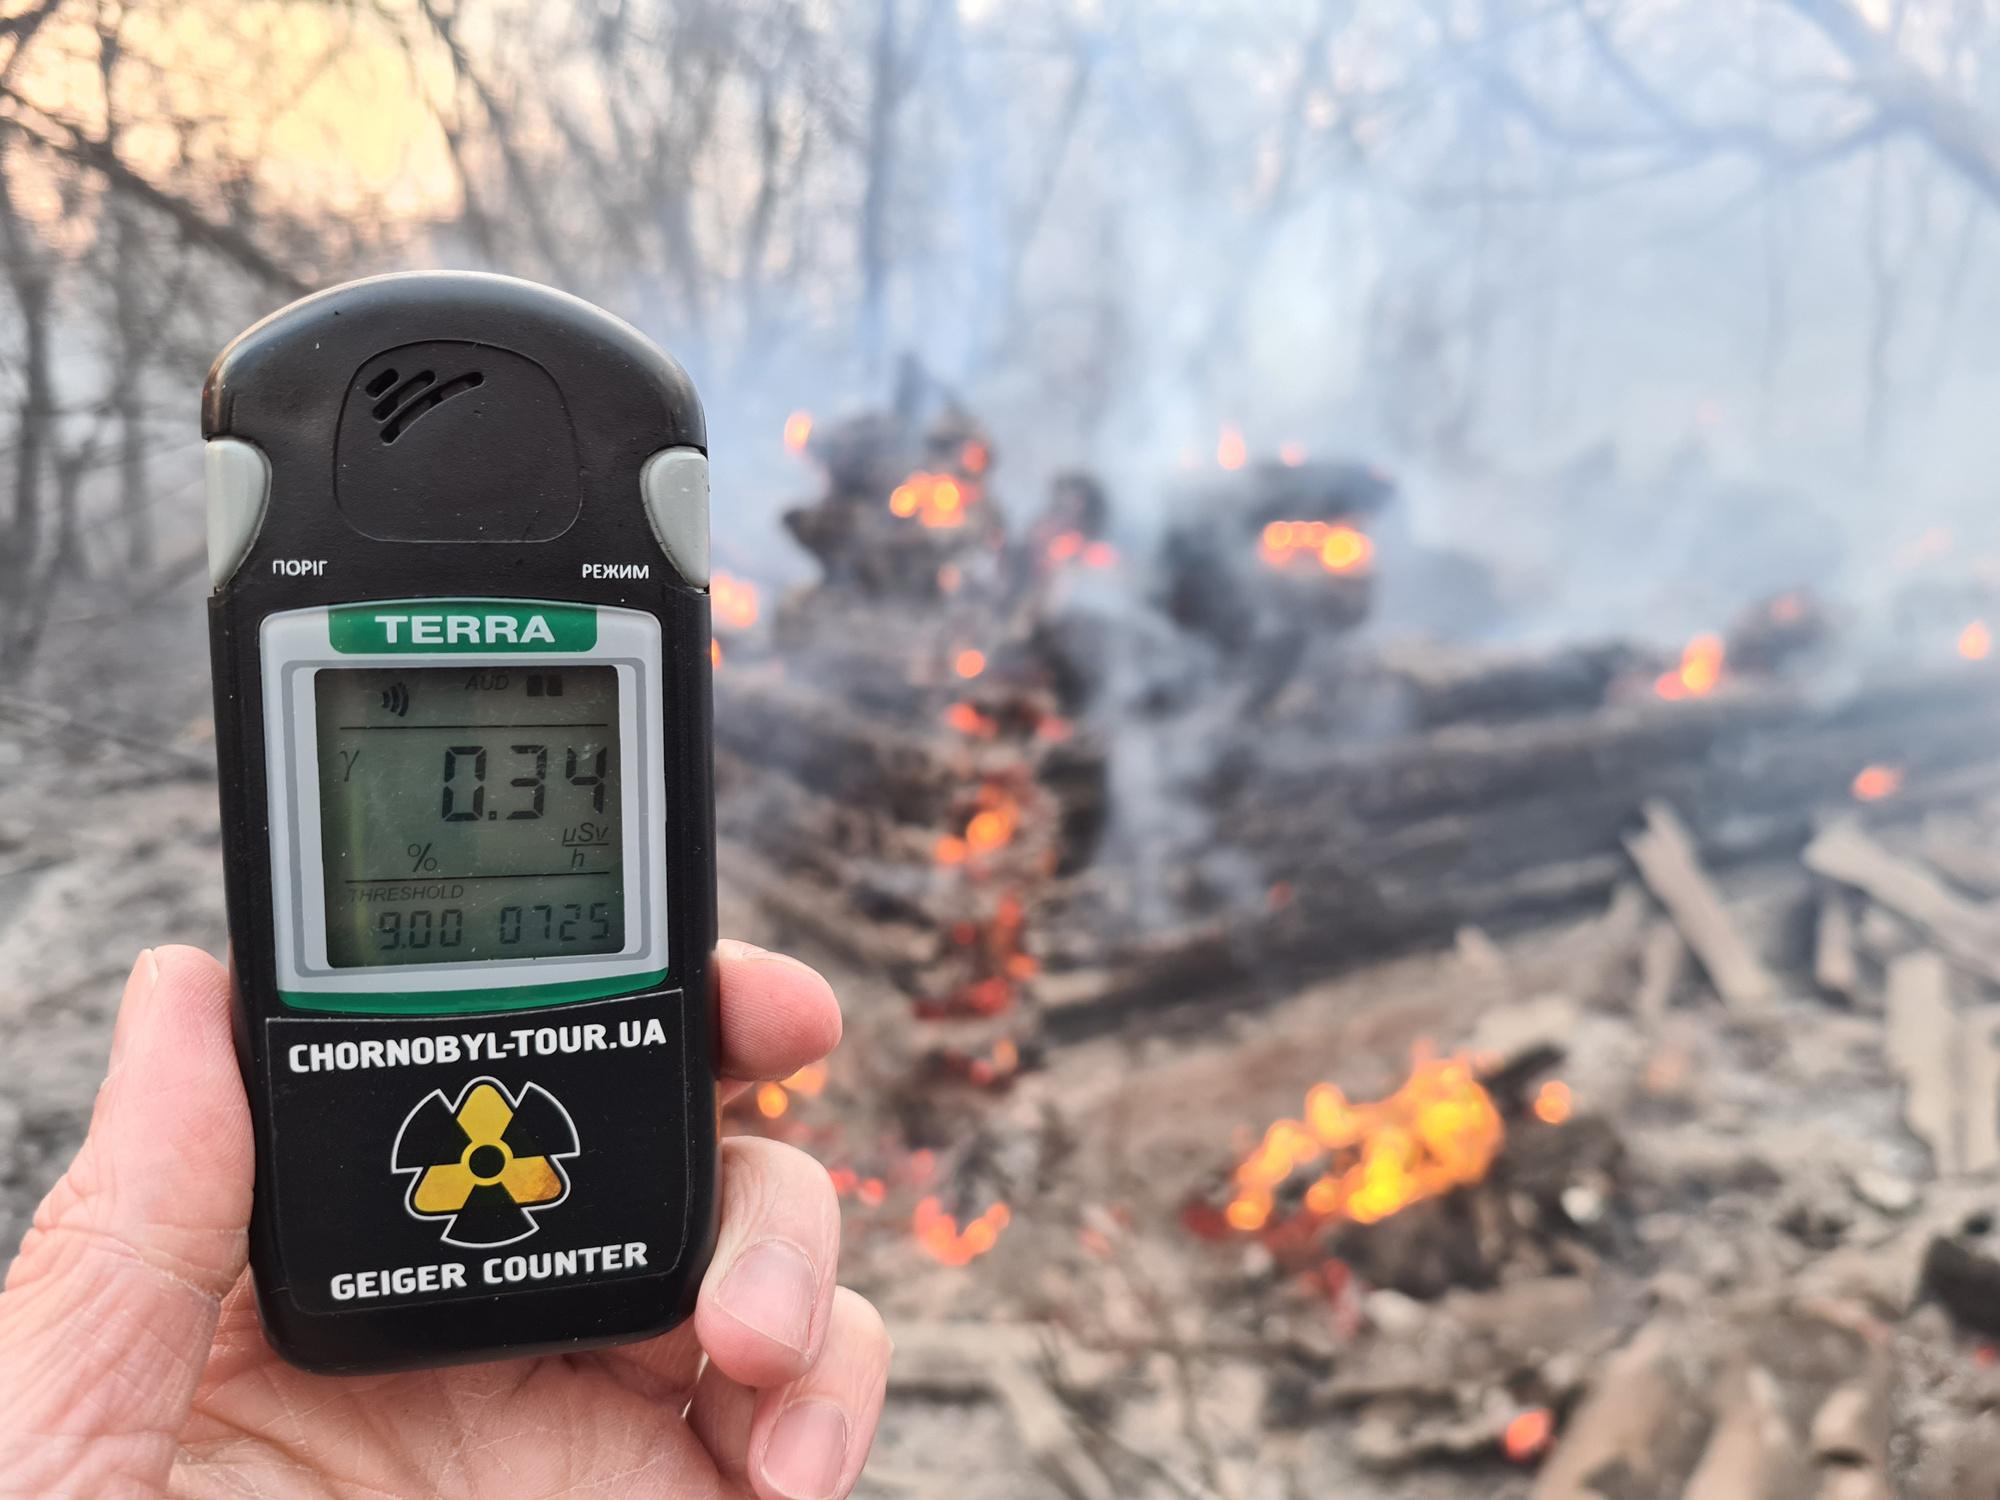 Compteur Geiger à 30 kilomètres de la zone d'exclusion de Tchernobyl., Yaroslav EMELIANENKO / AFP